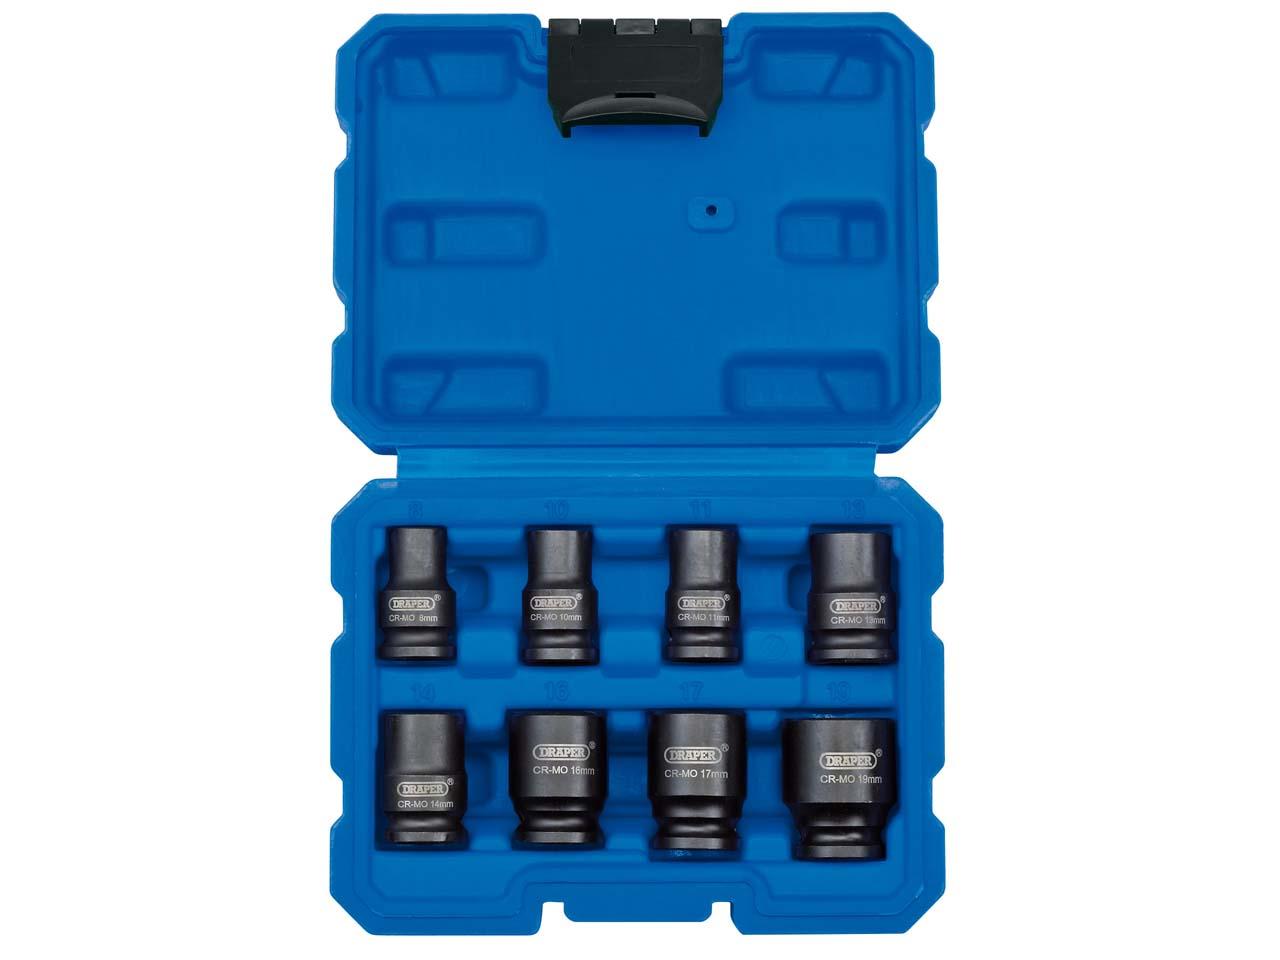 Draper 409-mmc Expert Square Drive Hi-torq 6 Point Impact Socket Blue 15mm